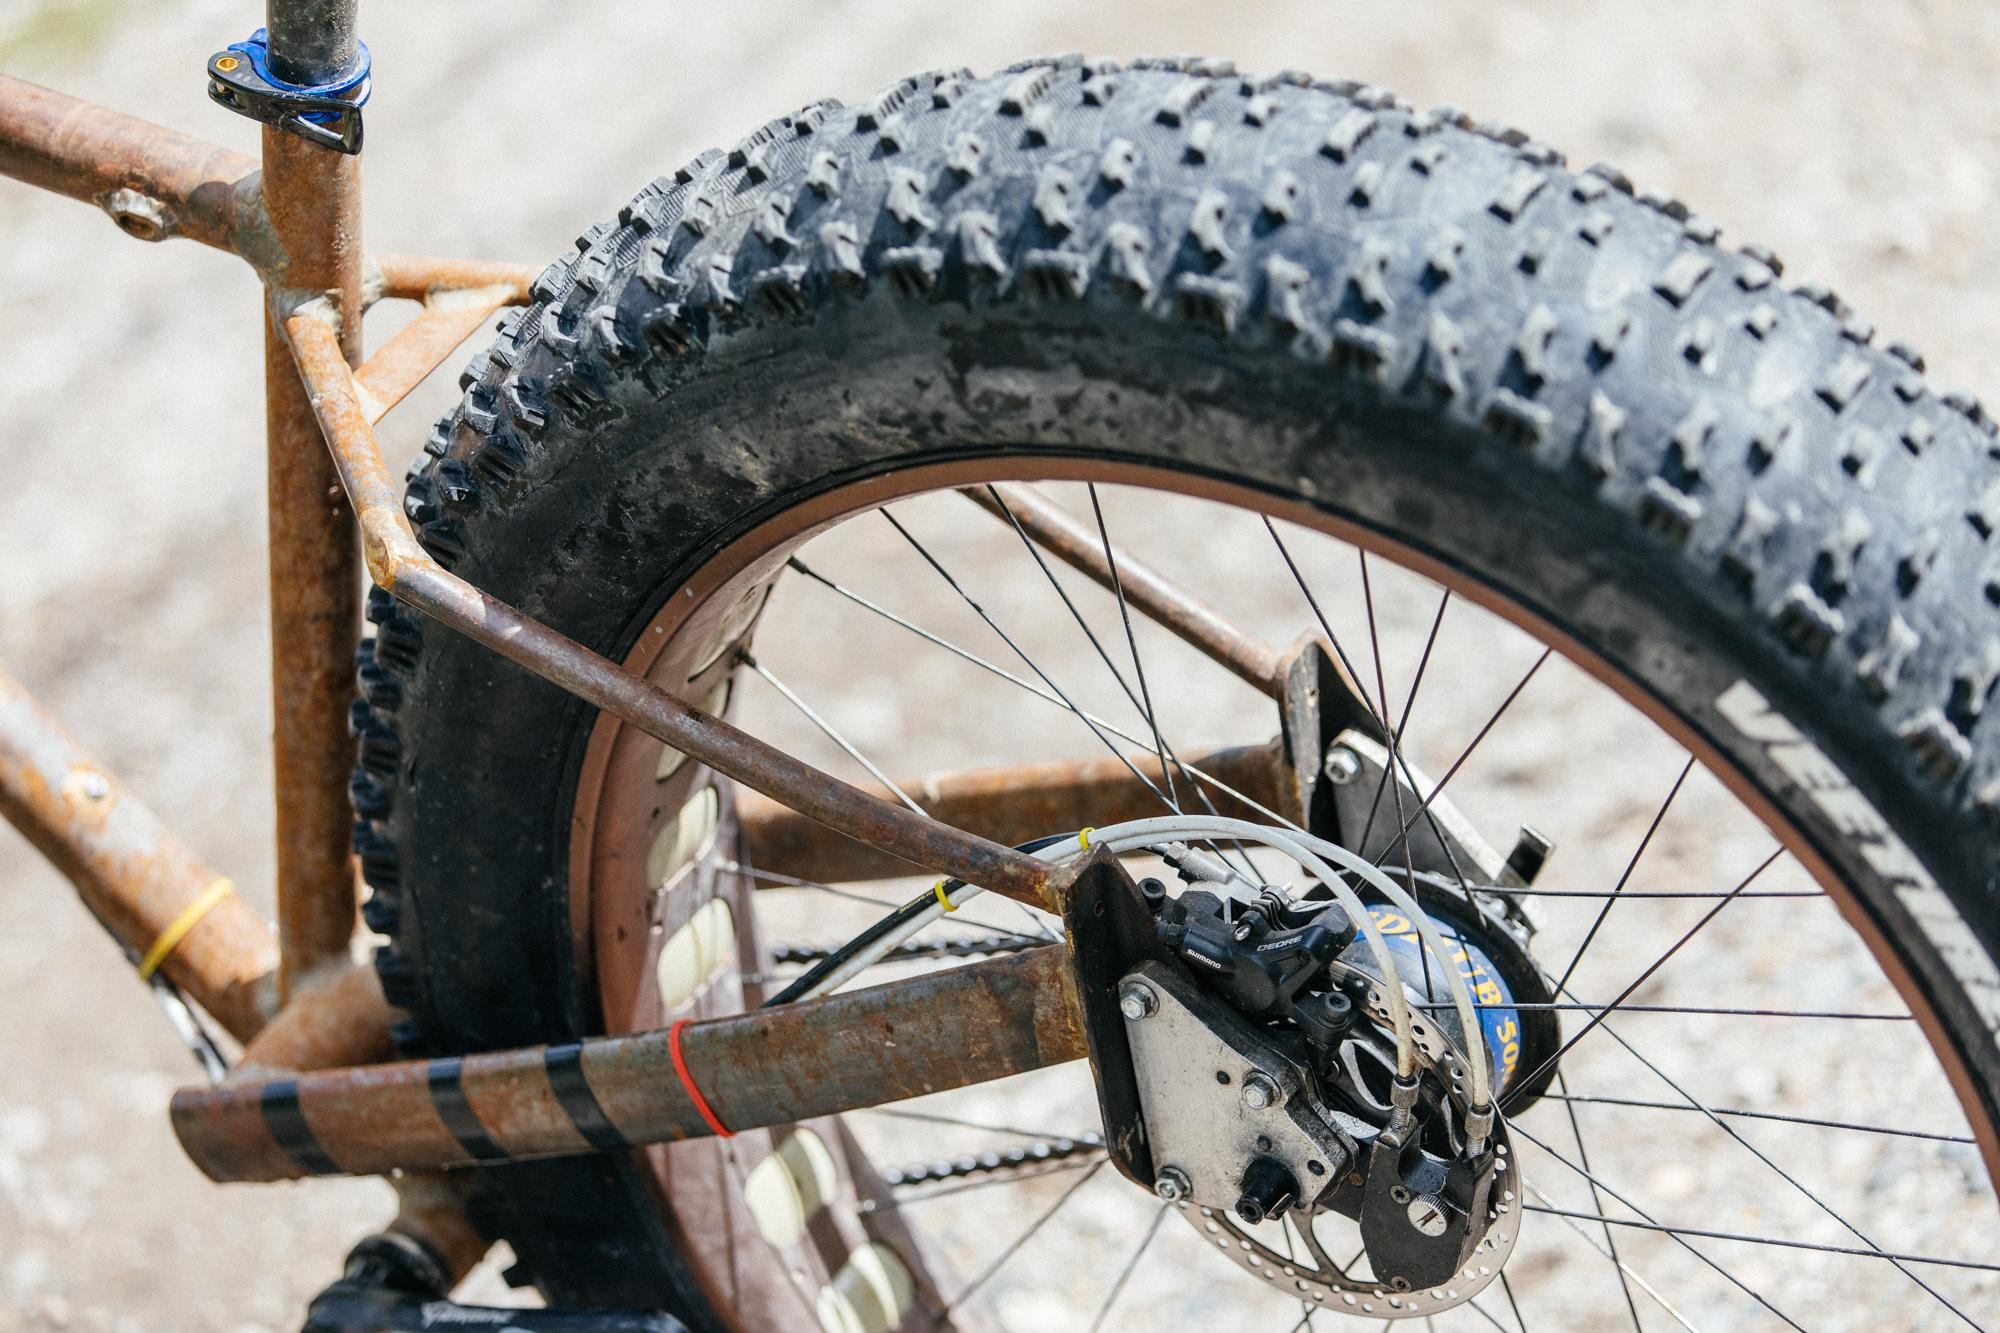 Sams-Garage-Built-Fat-Bike-7.jpg